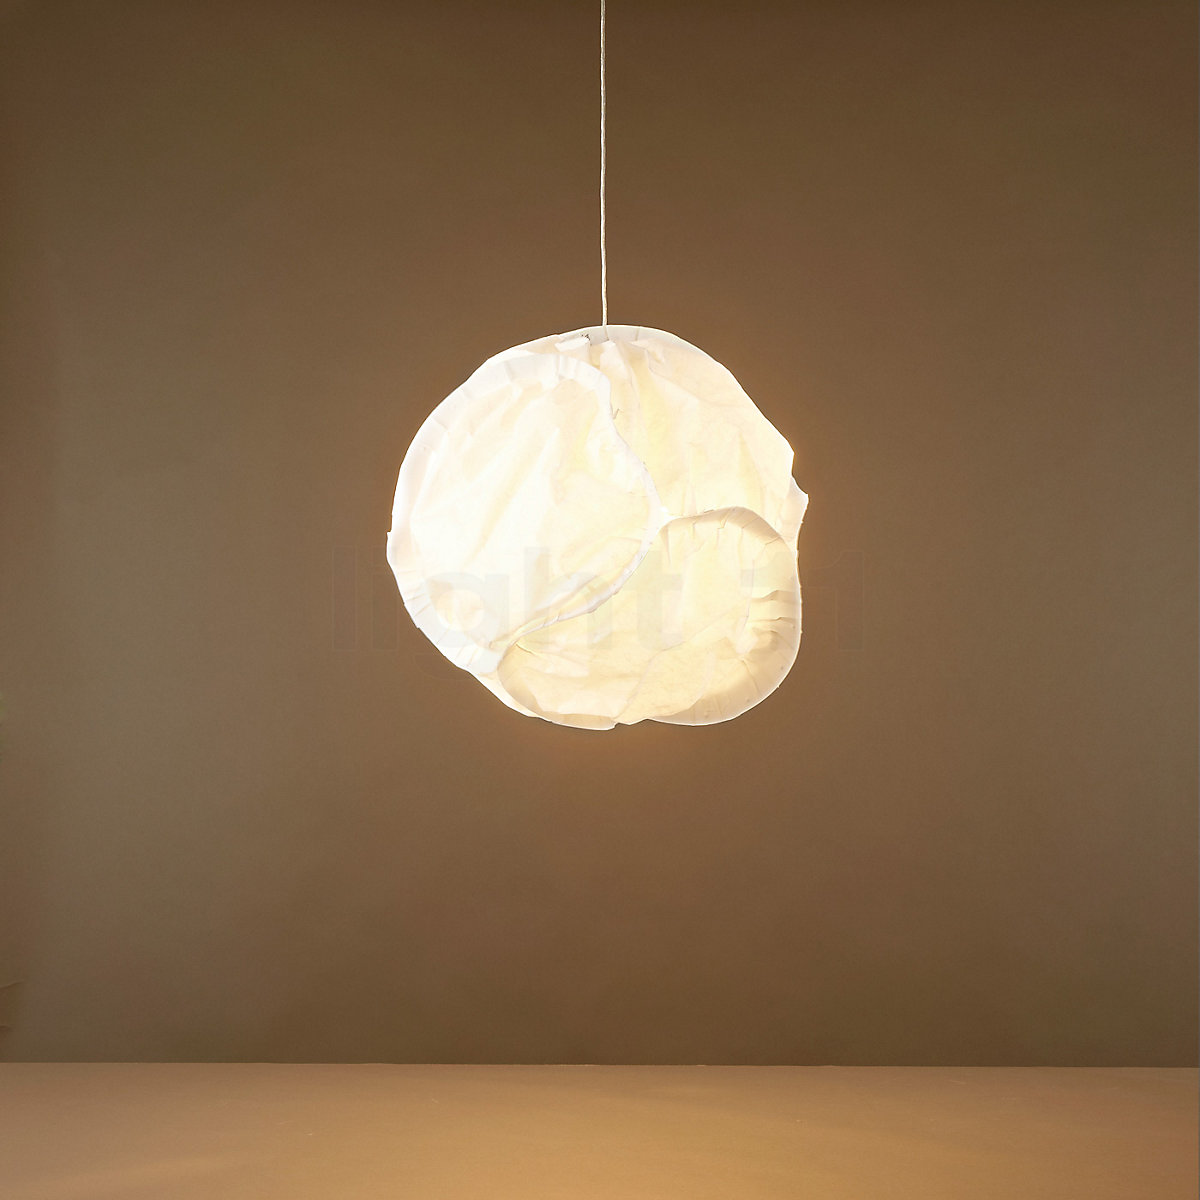 Buy Belux Cloud Pendant Light At Light11 Eu